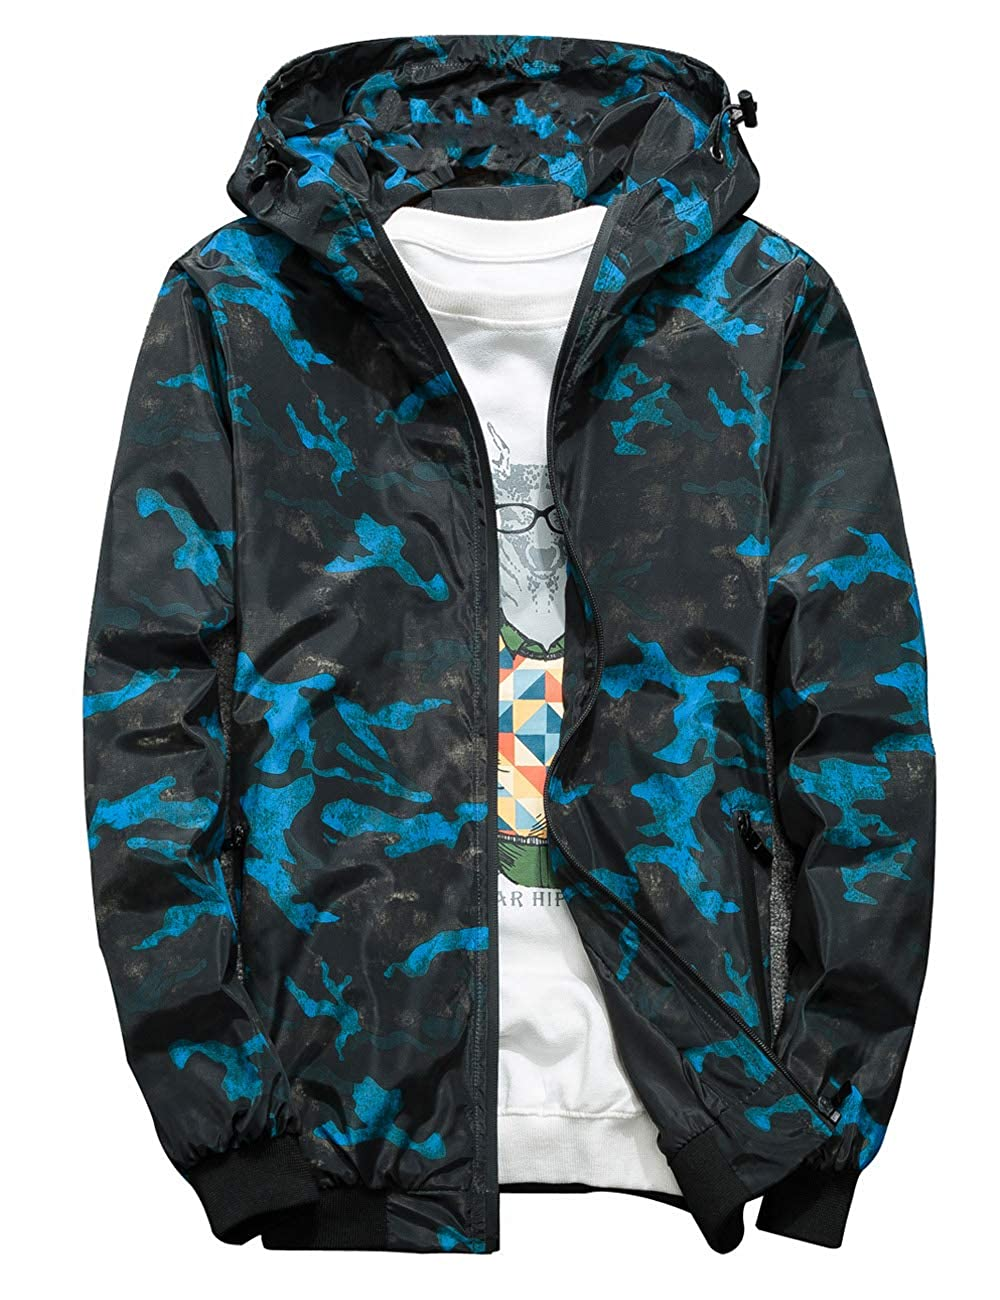 Rexcyril Mens Windbreaker Jacket Floral Bomber Jacket Lightweight Zip-up Hooded Coat